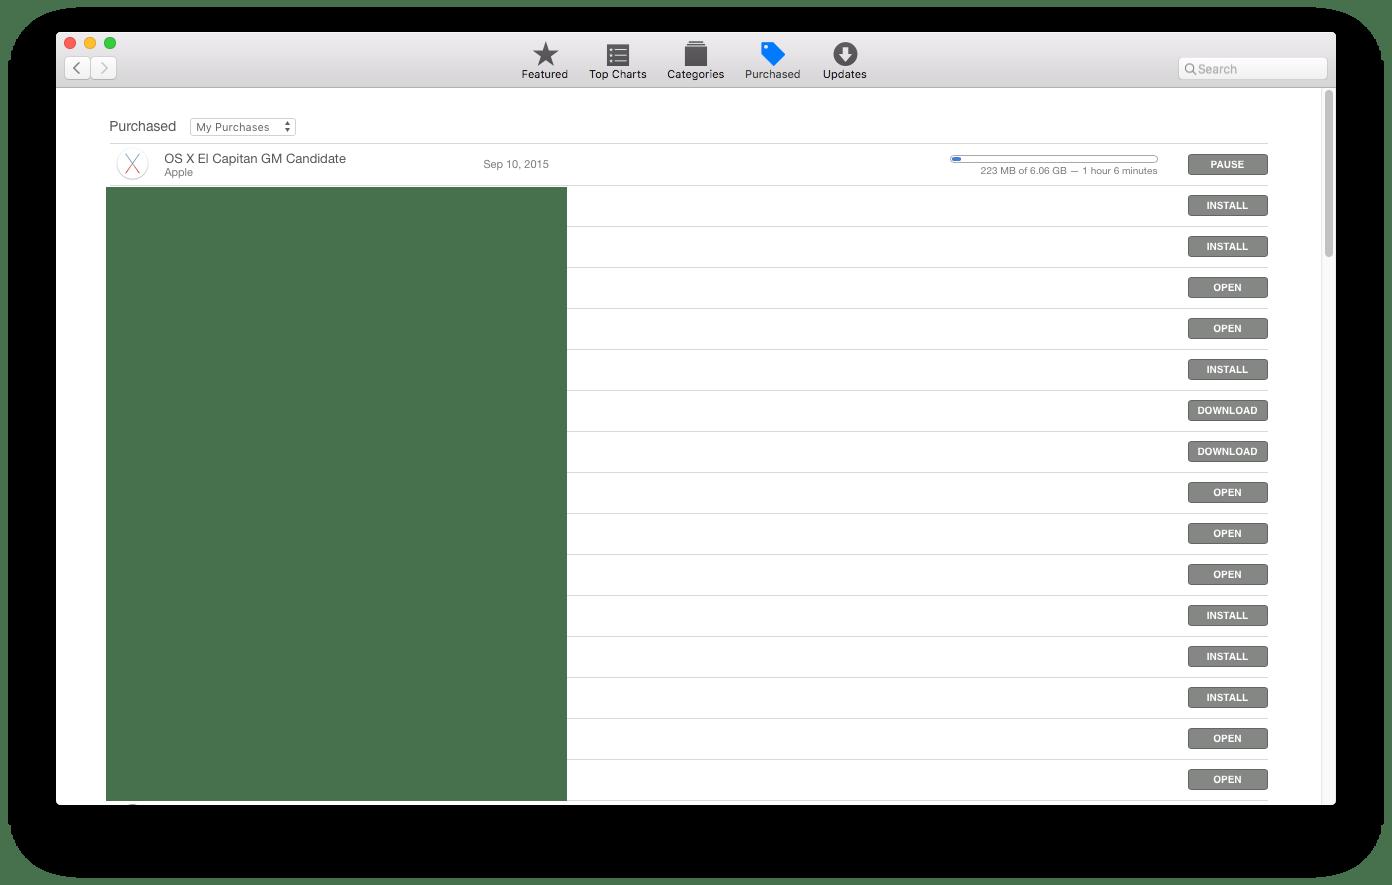 Apple Releases OS X El Capitan Golden Master to Developers